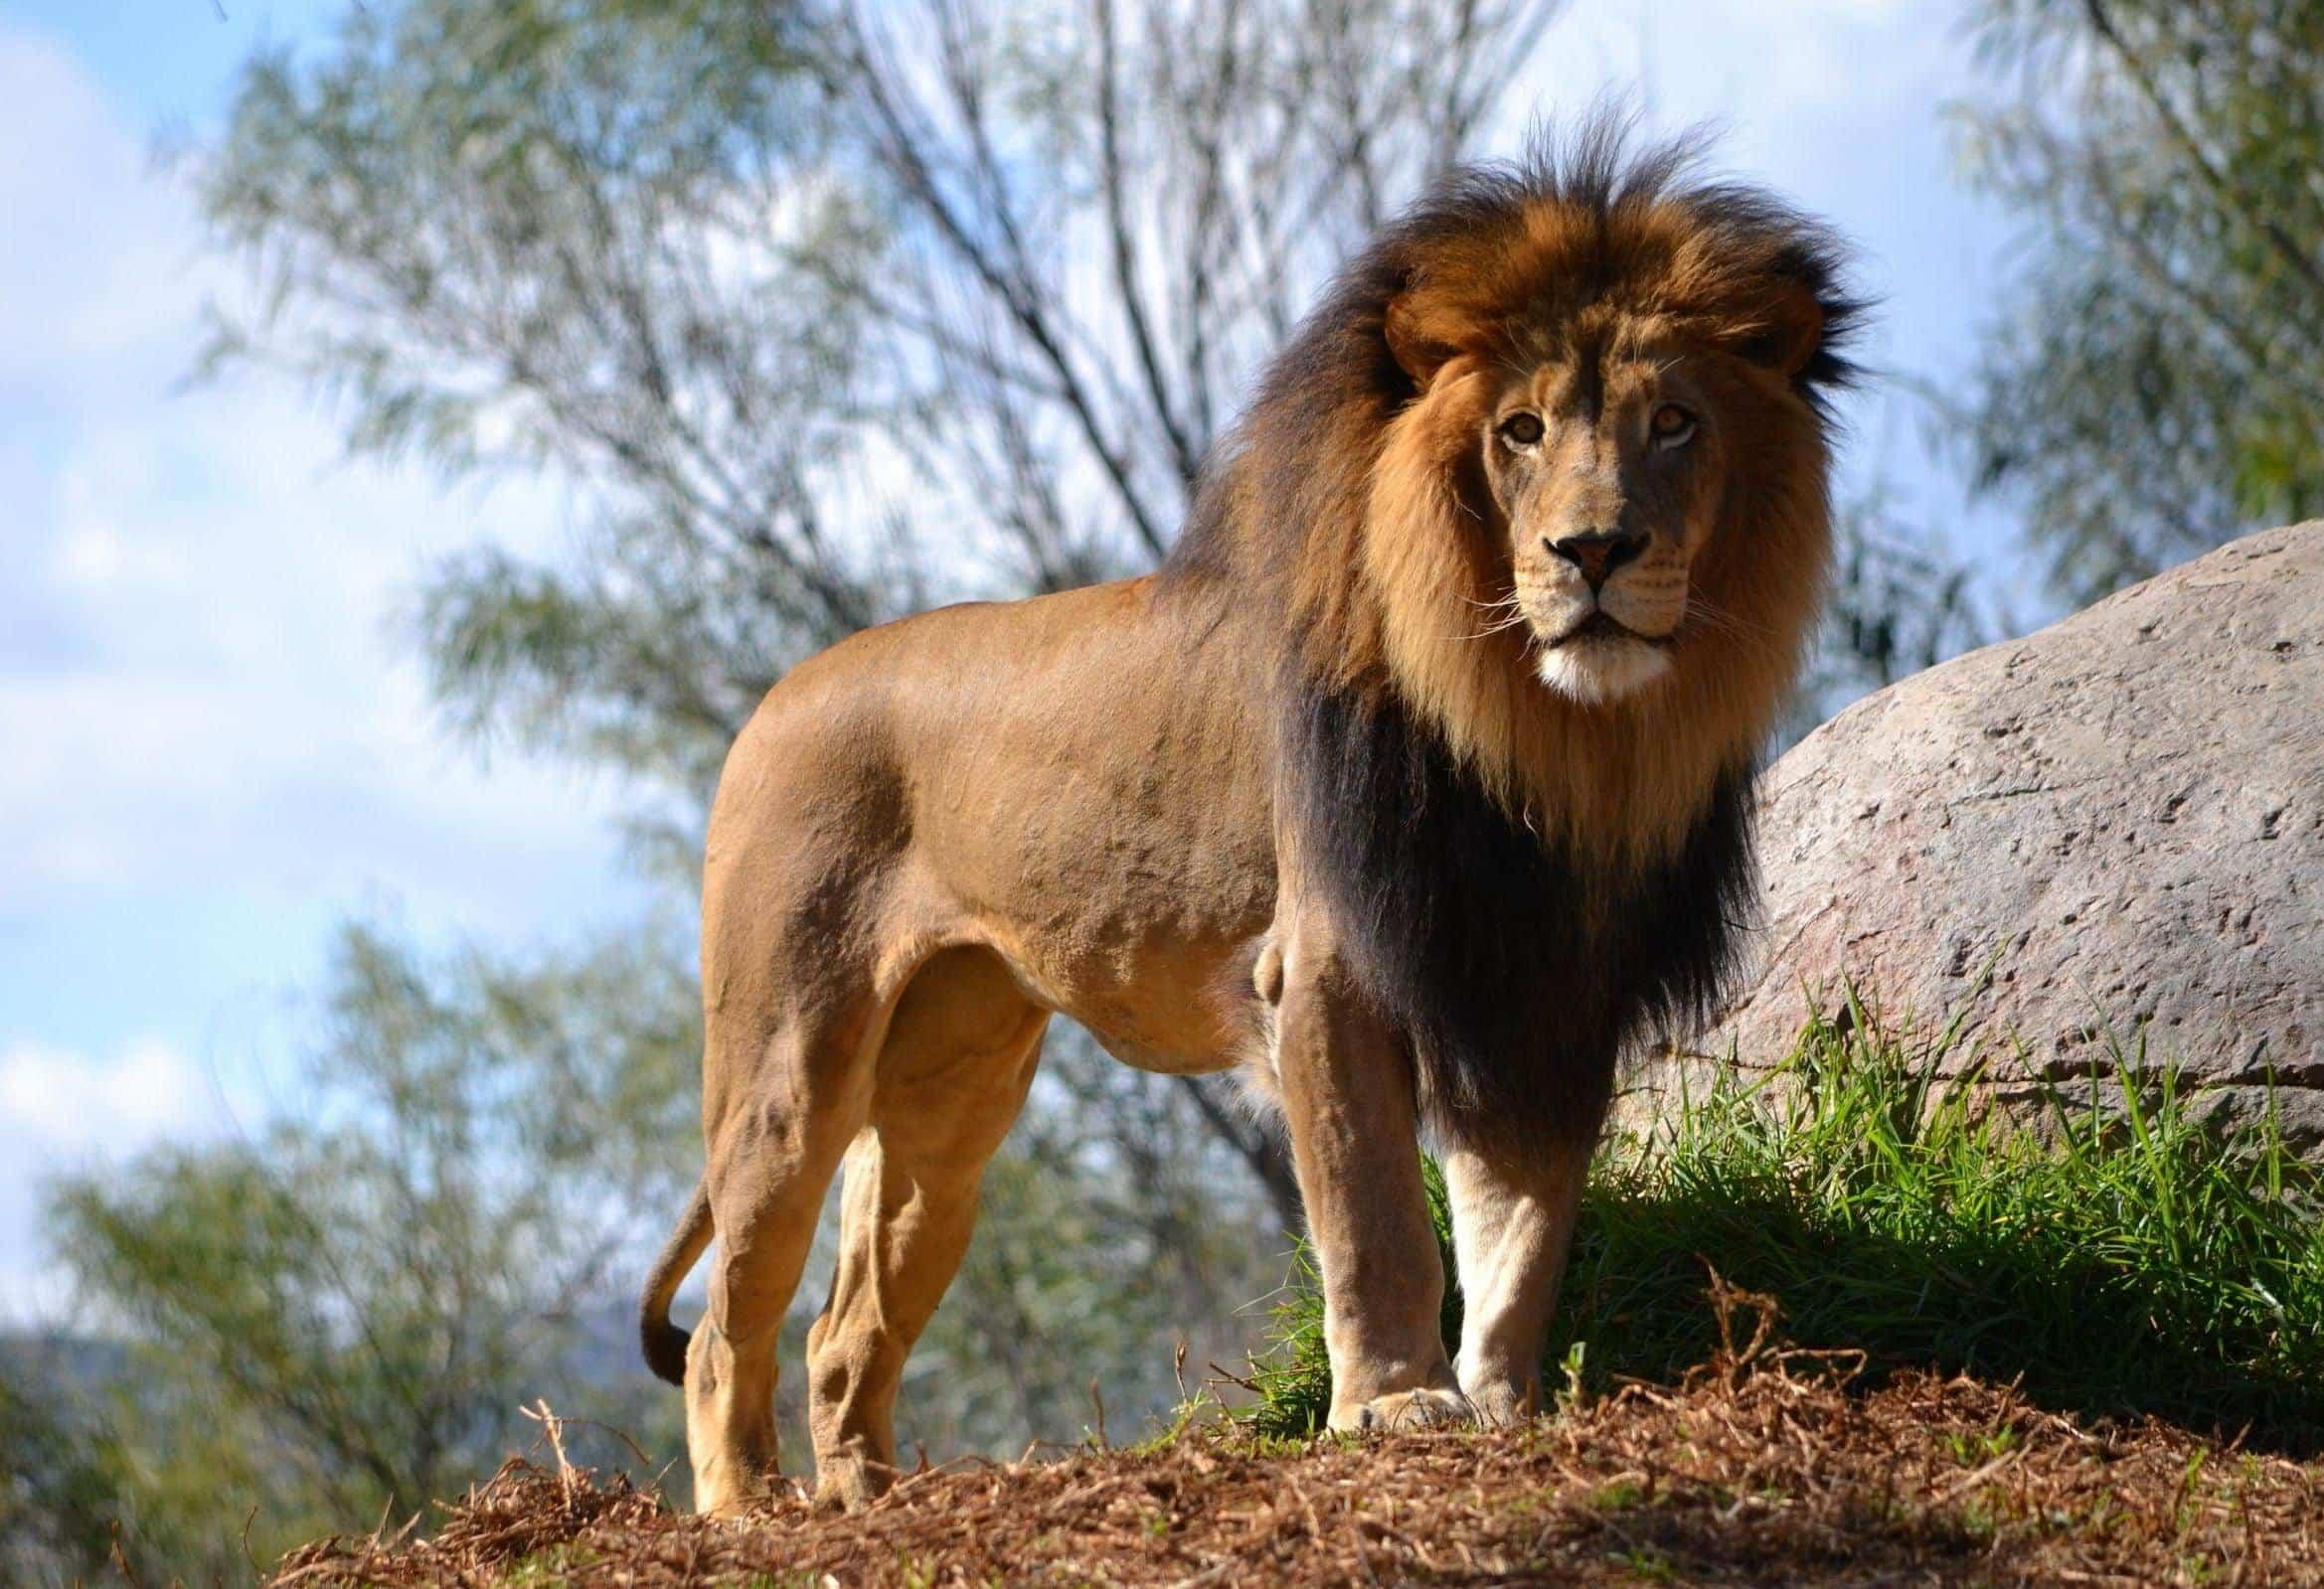 lion dream meaning, dream about lion, lion dream interpretation, seeing in a dream lion